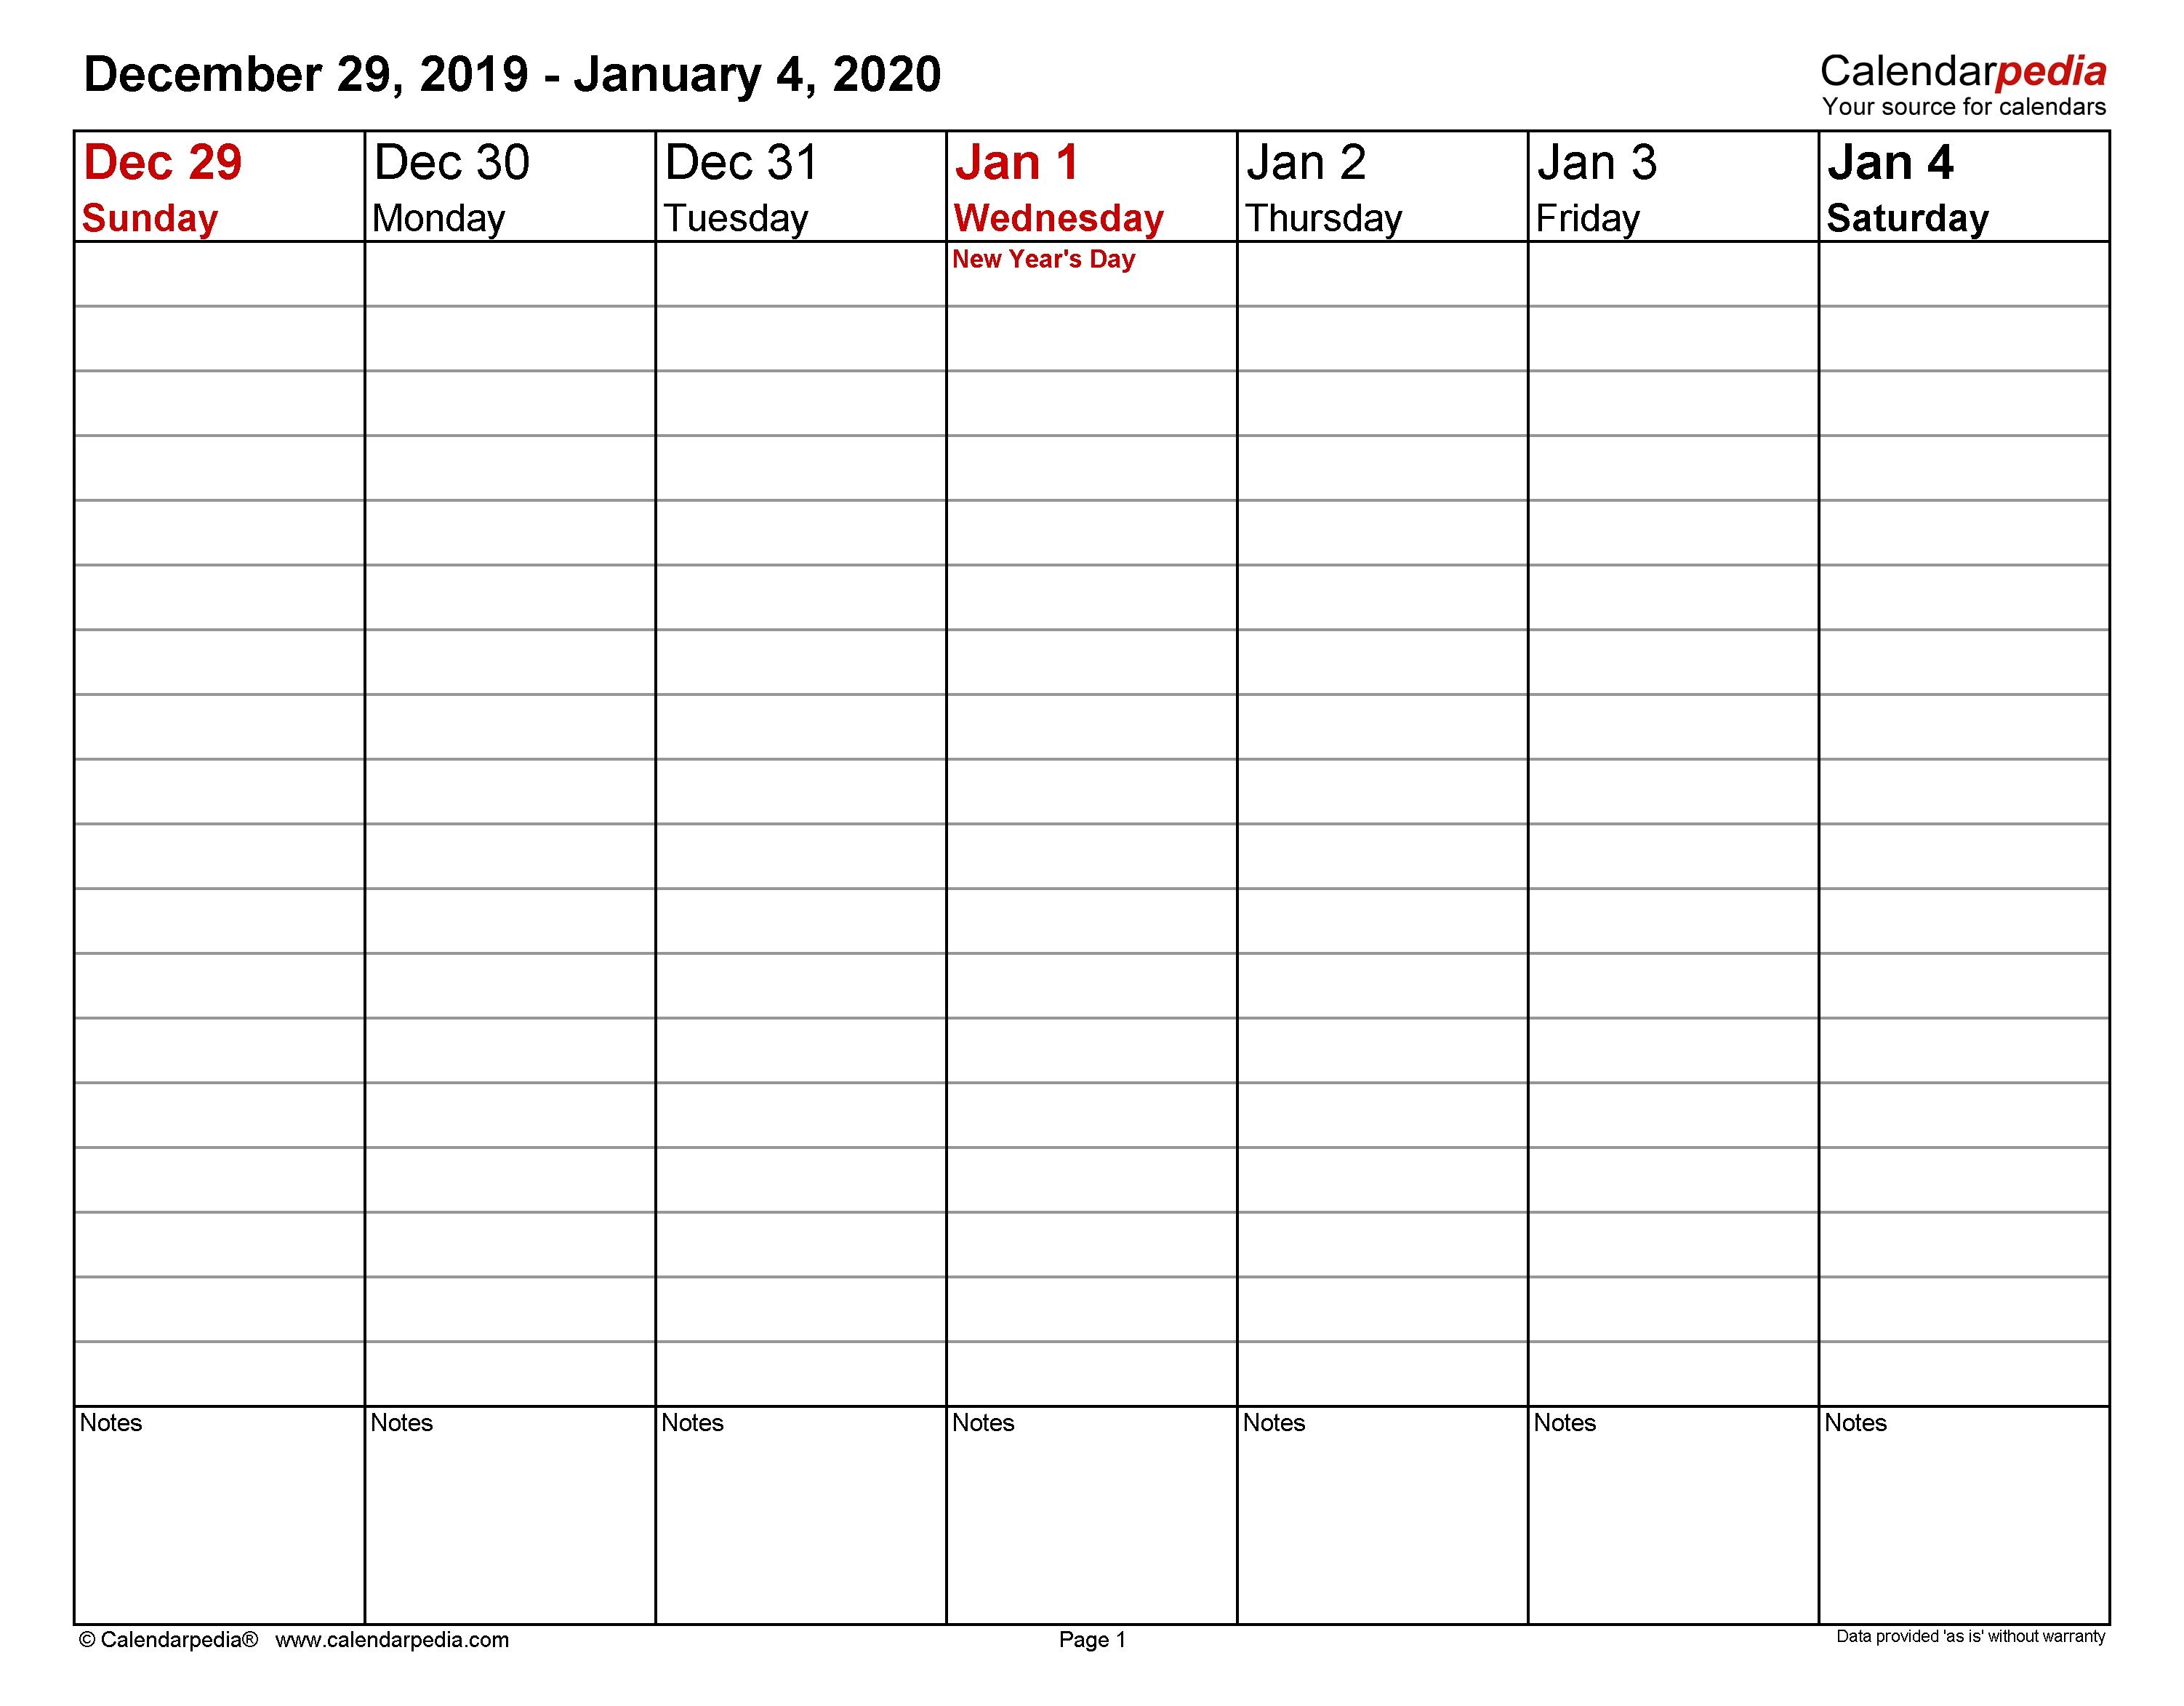 Weekly Calendars 2020 For Word - 12 Free Printable Templates  Weekly Calendar 2020